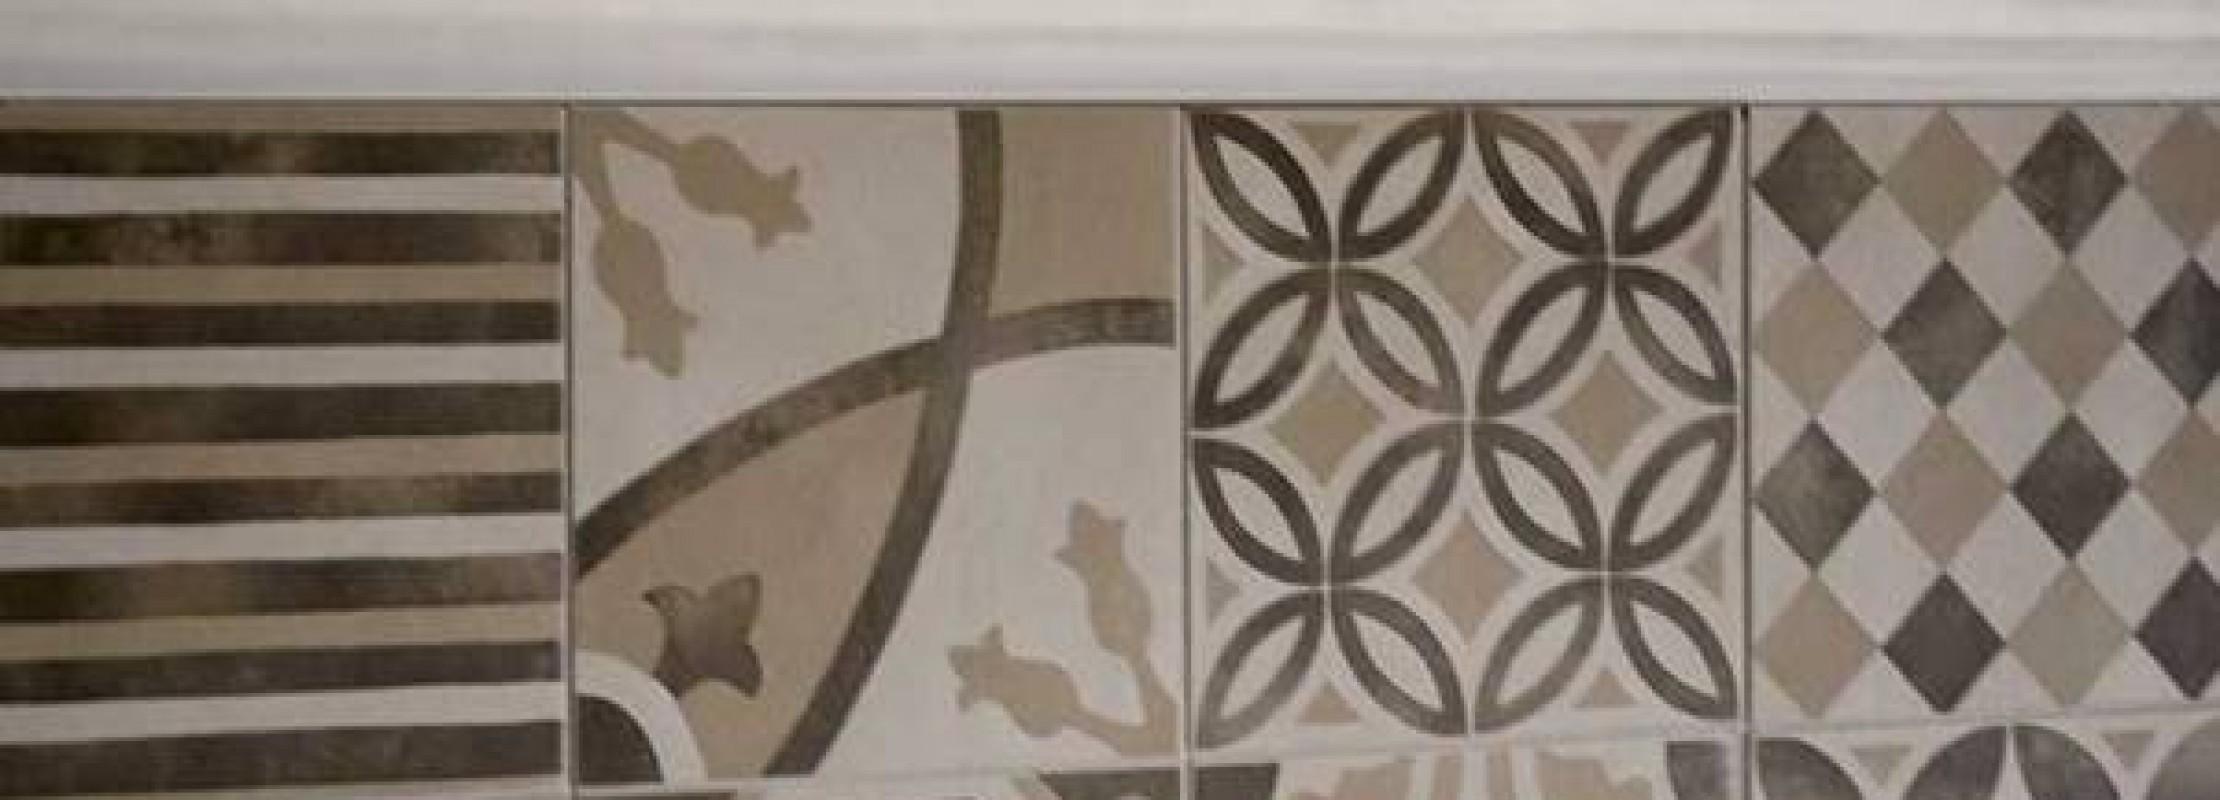 Marazzi Ceramiche Listino Prezzi.Pavimenti E Rivestimenti Marazzi Modelli E Prezzi Blog Edilnet